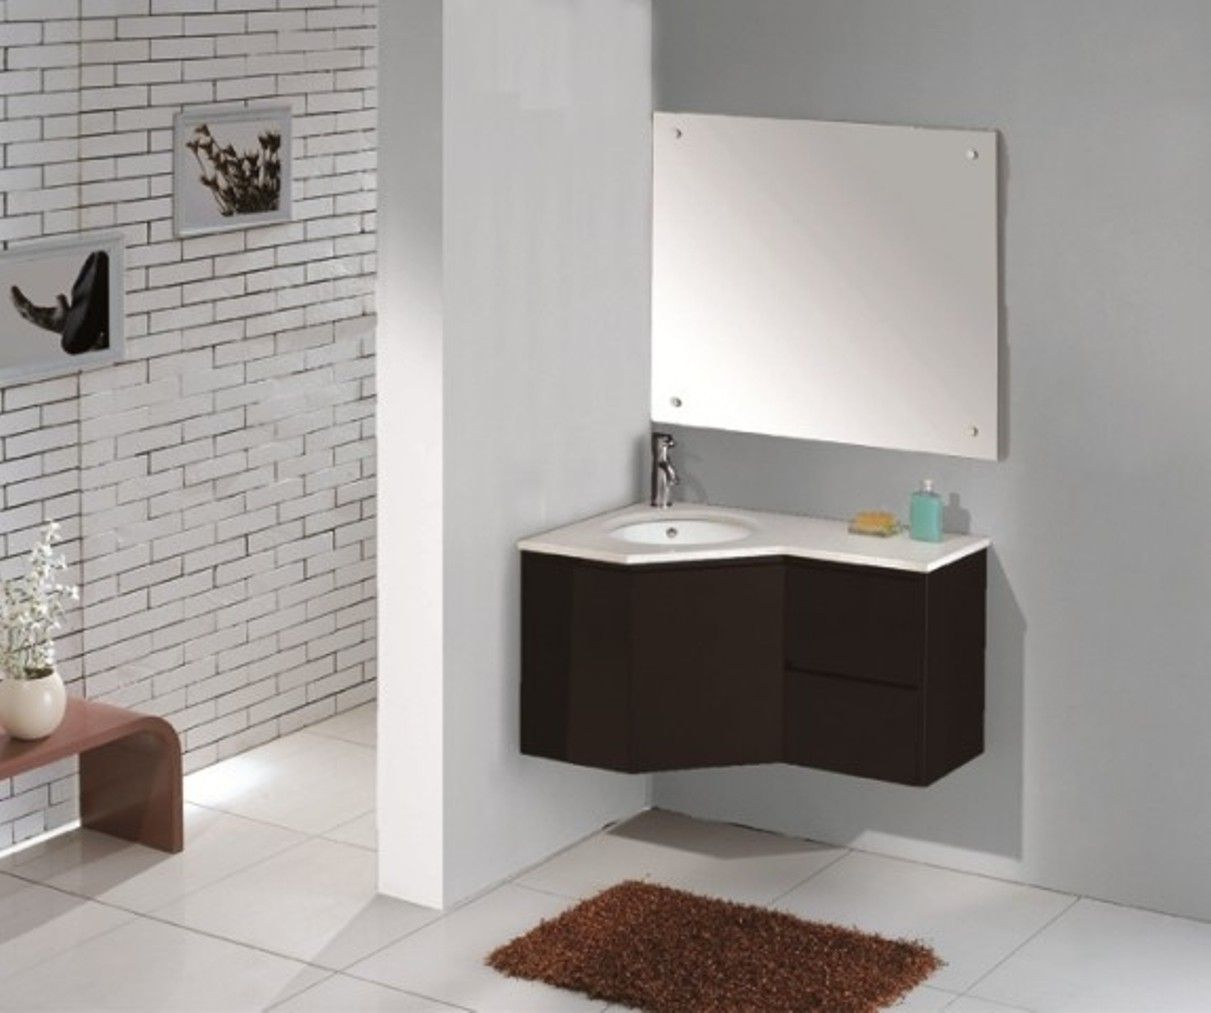 Marble Corner Sink With White Sink Bowl For Corner Bathroom Sink